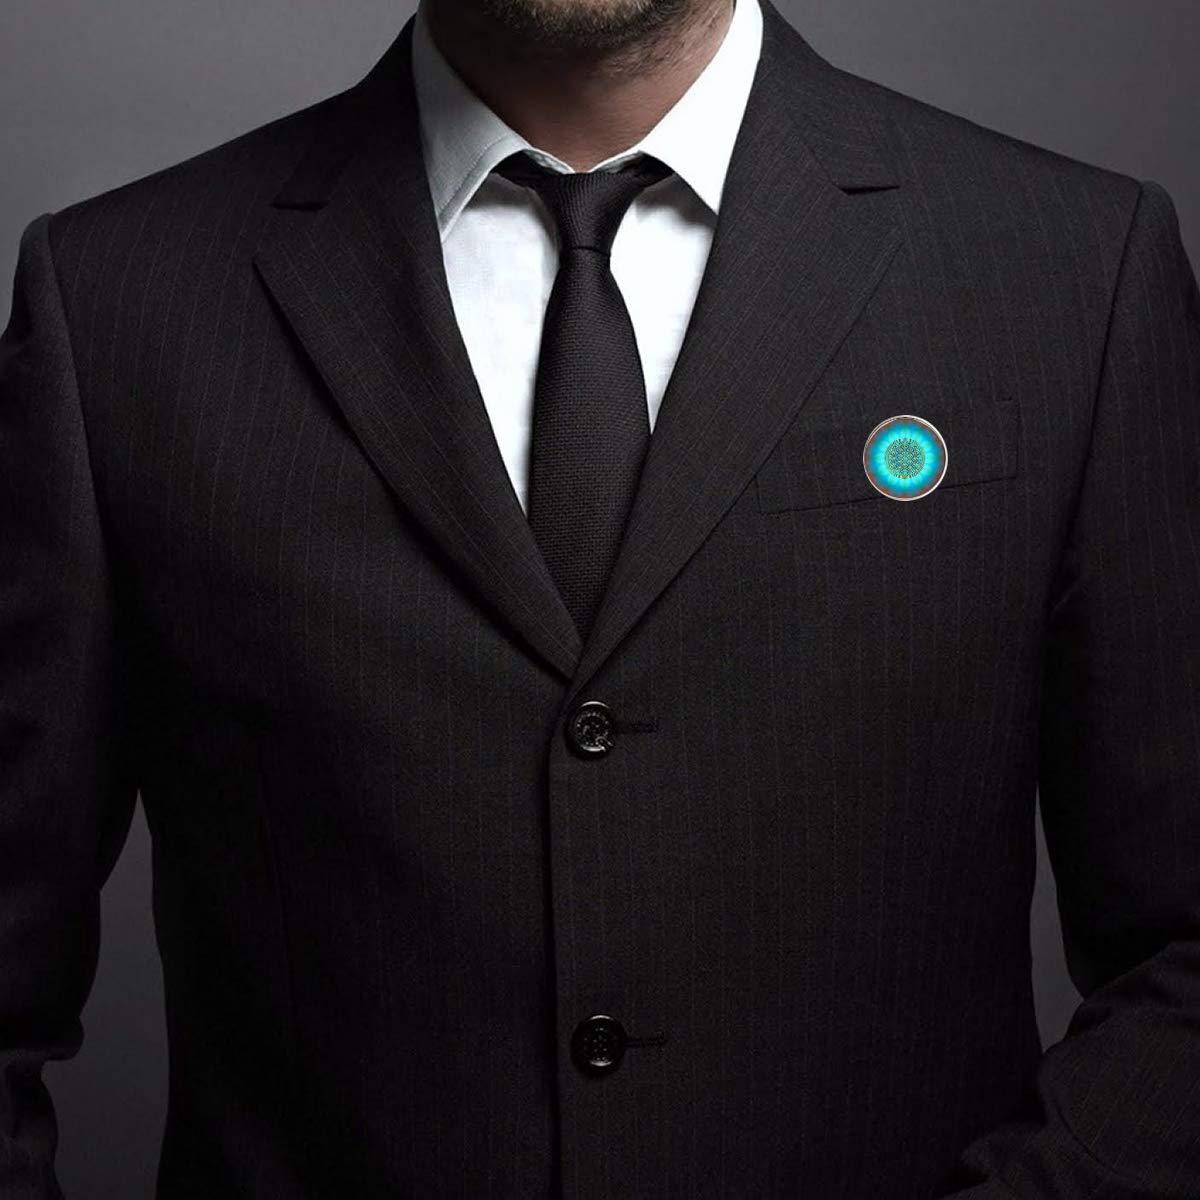 Pinback Buttons Badges Pins Blue Flower Phantom Lapel Pin Brooch Clip Trendy Accessory Jacket T-Shirt Bag Hat Shoe